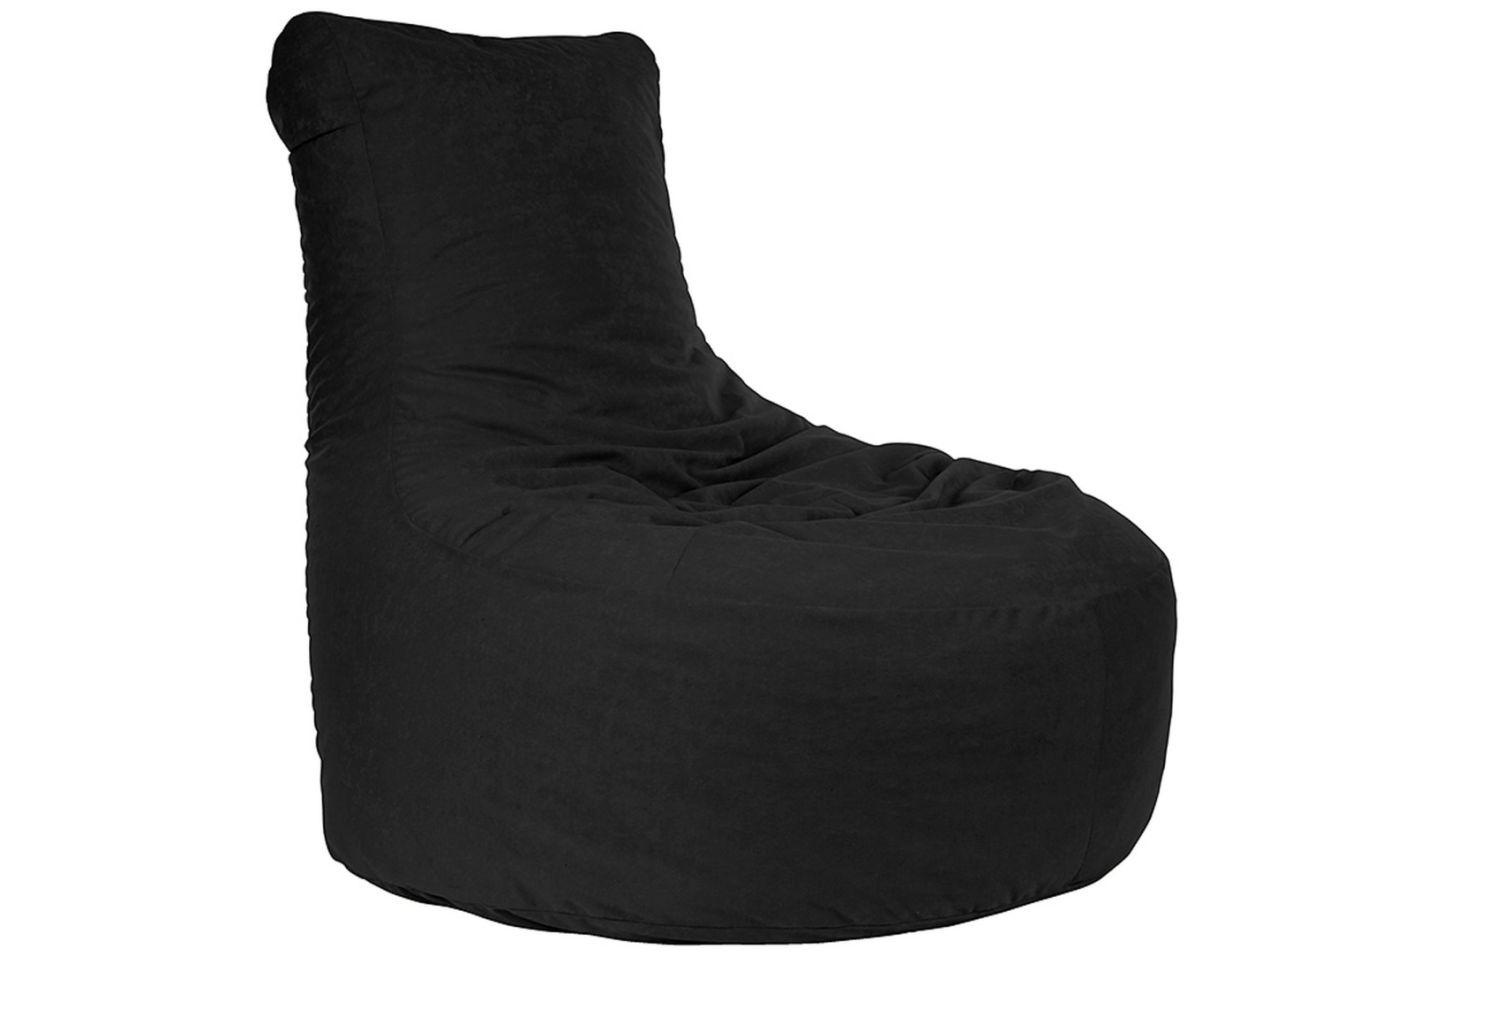 sitzsack sofa sessel kissen bodenkissen sitzs cke loungesessel kindersitzsack ebay. Black Bedroom Furniture Sets. Home Design Ideas